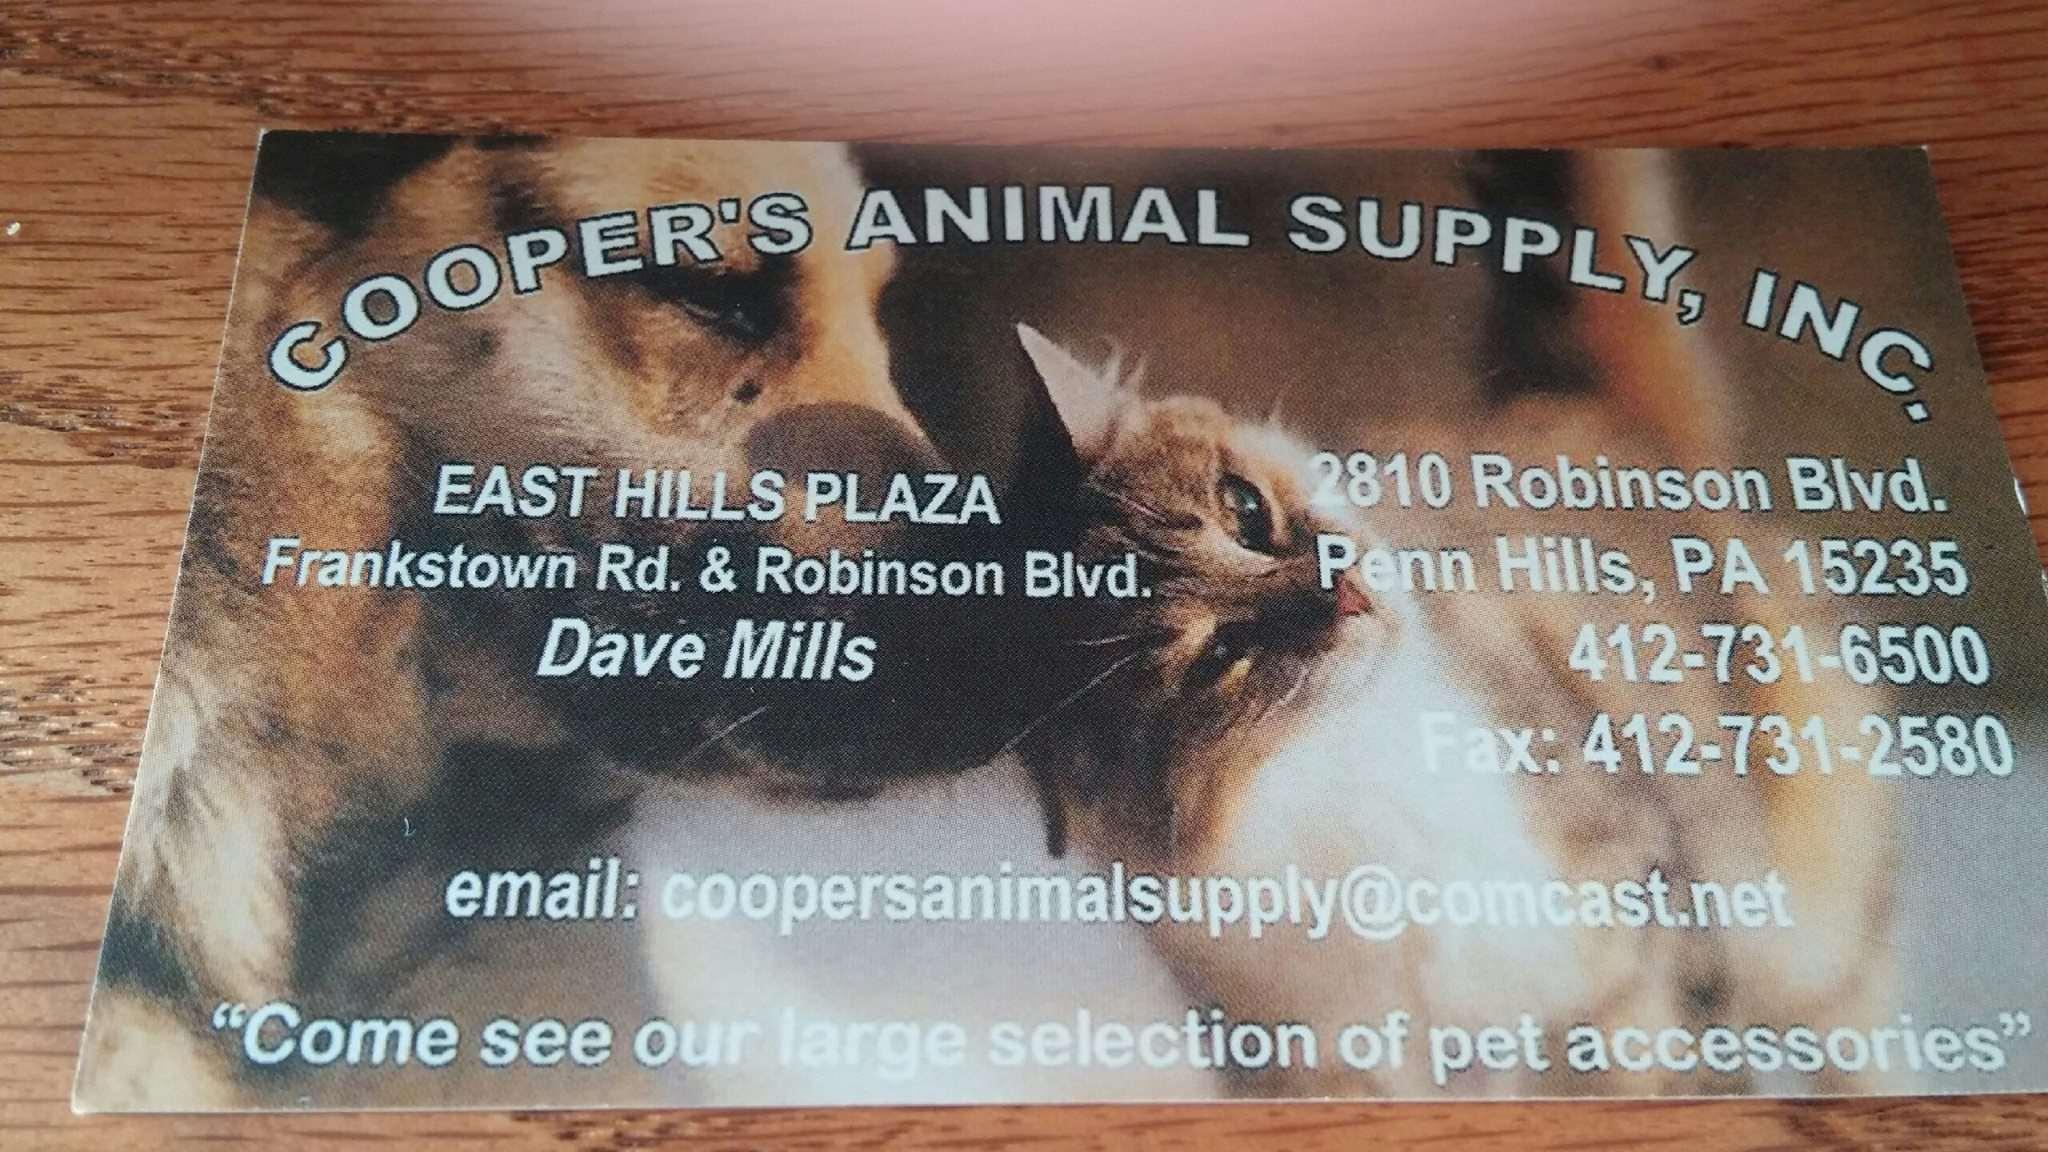 Cooper's Animal Supply, Inc.